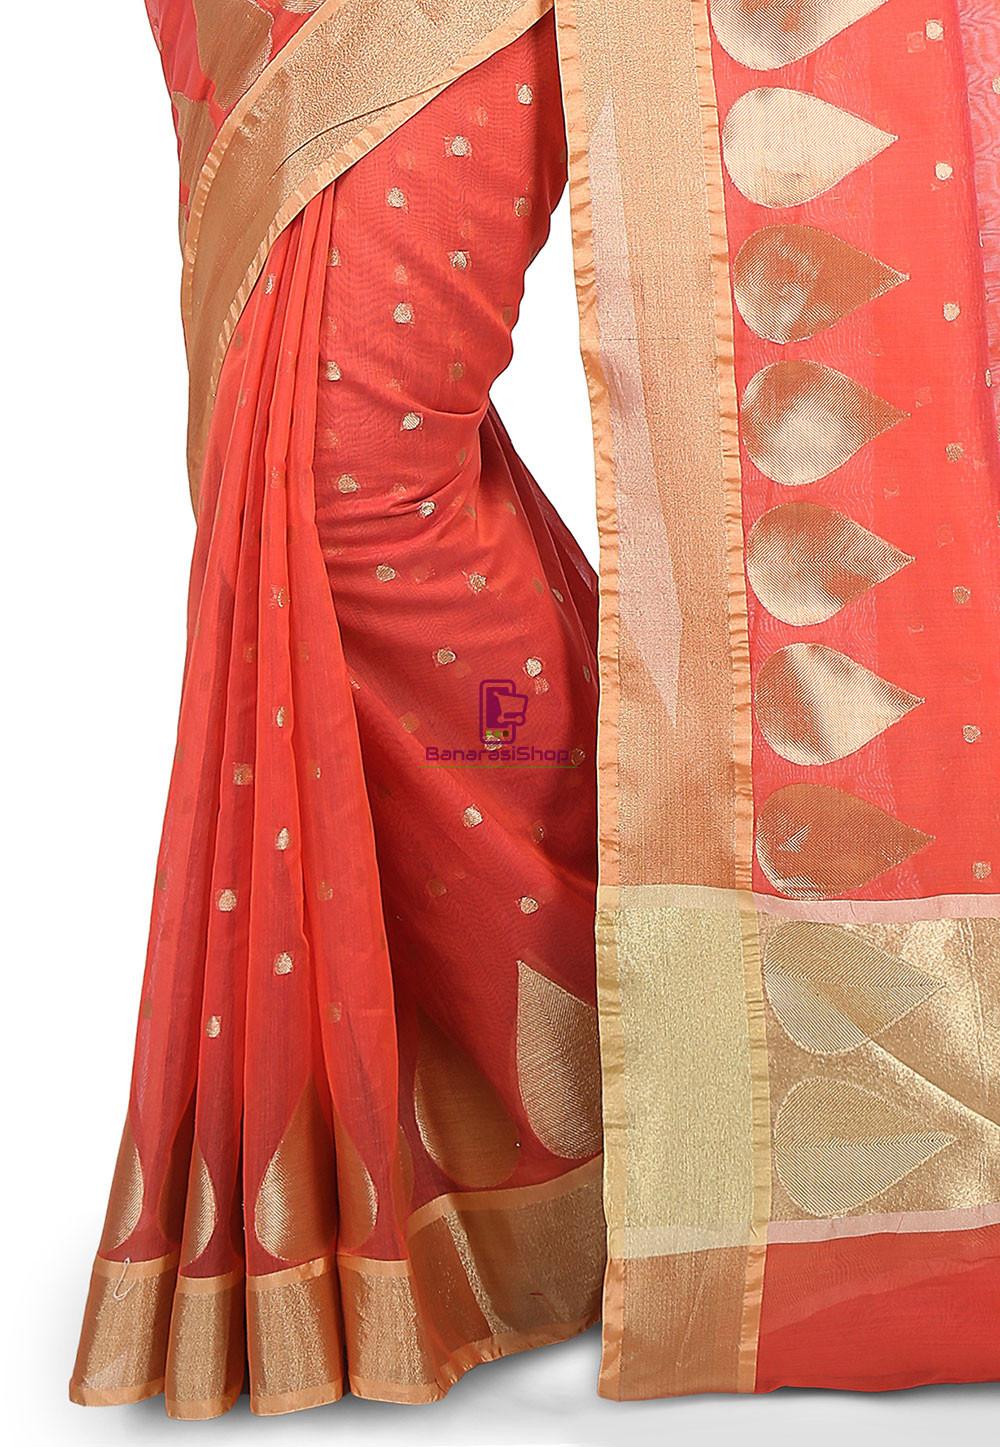 Woven Banarasi Chanderi Silk Saree in Coral Red 3